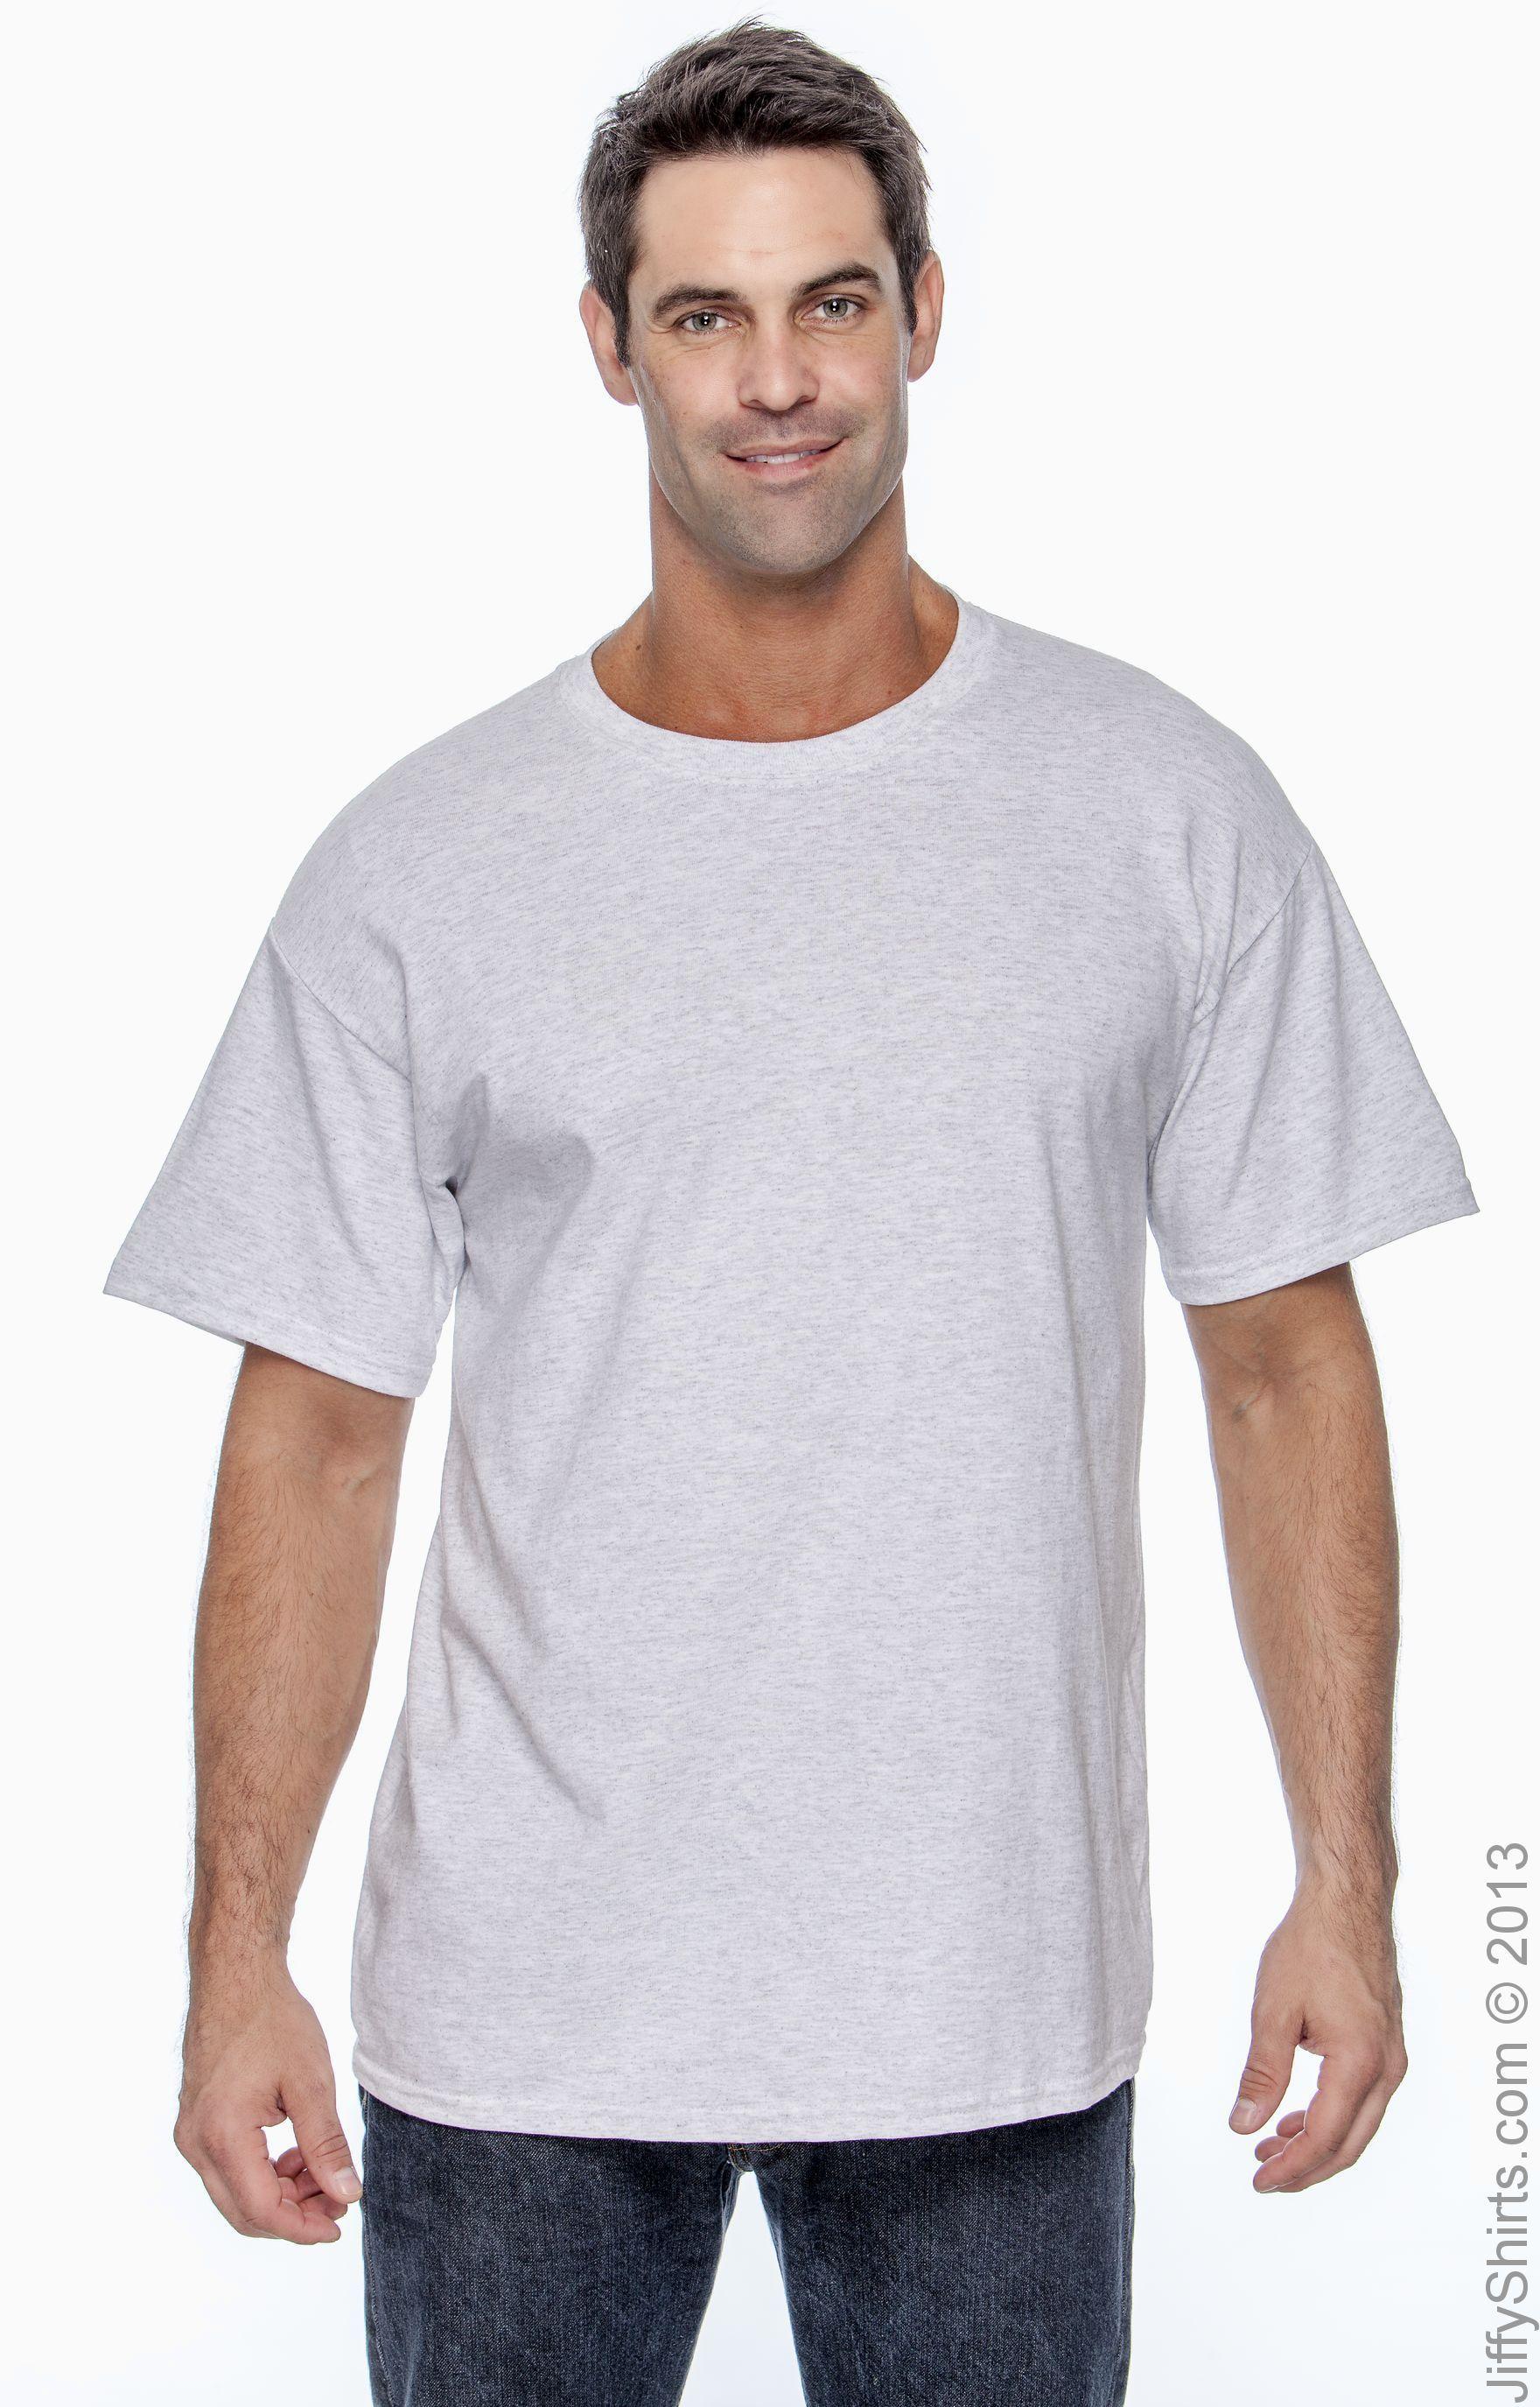 Style # 5250T - Original Label ASH Hanes Mens 61 oz Tagless T-Shirt 3XL -